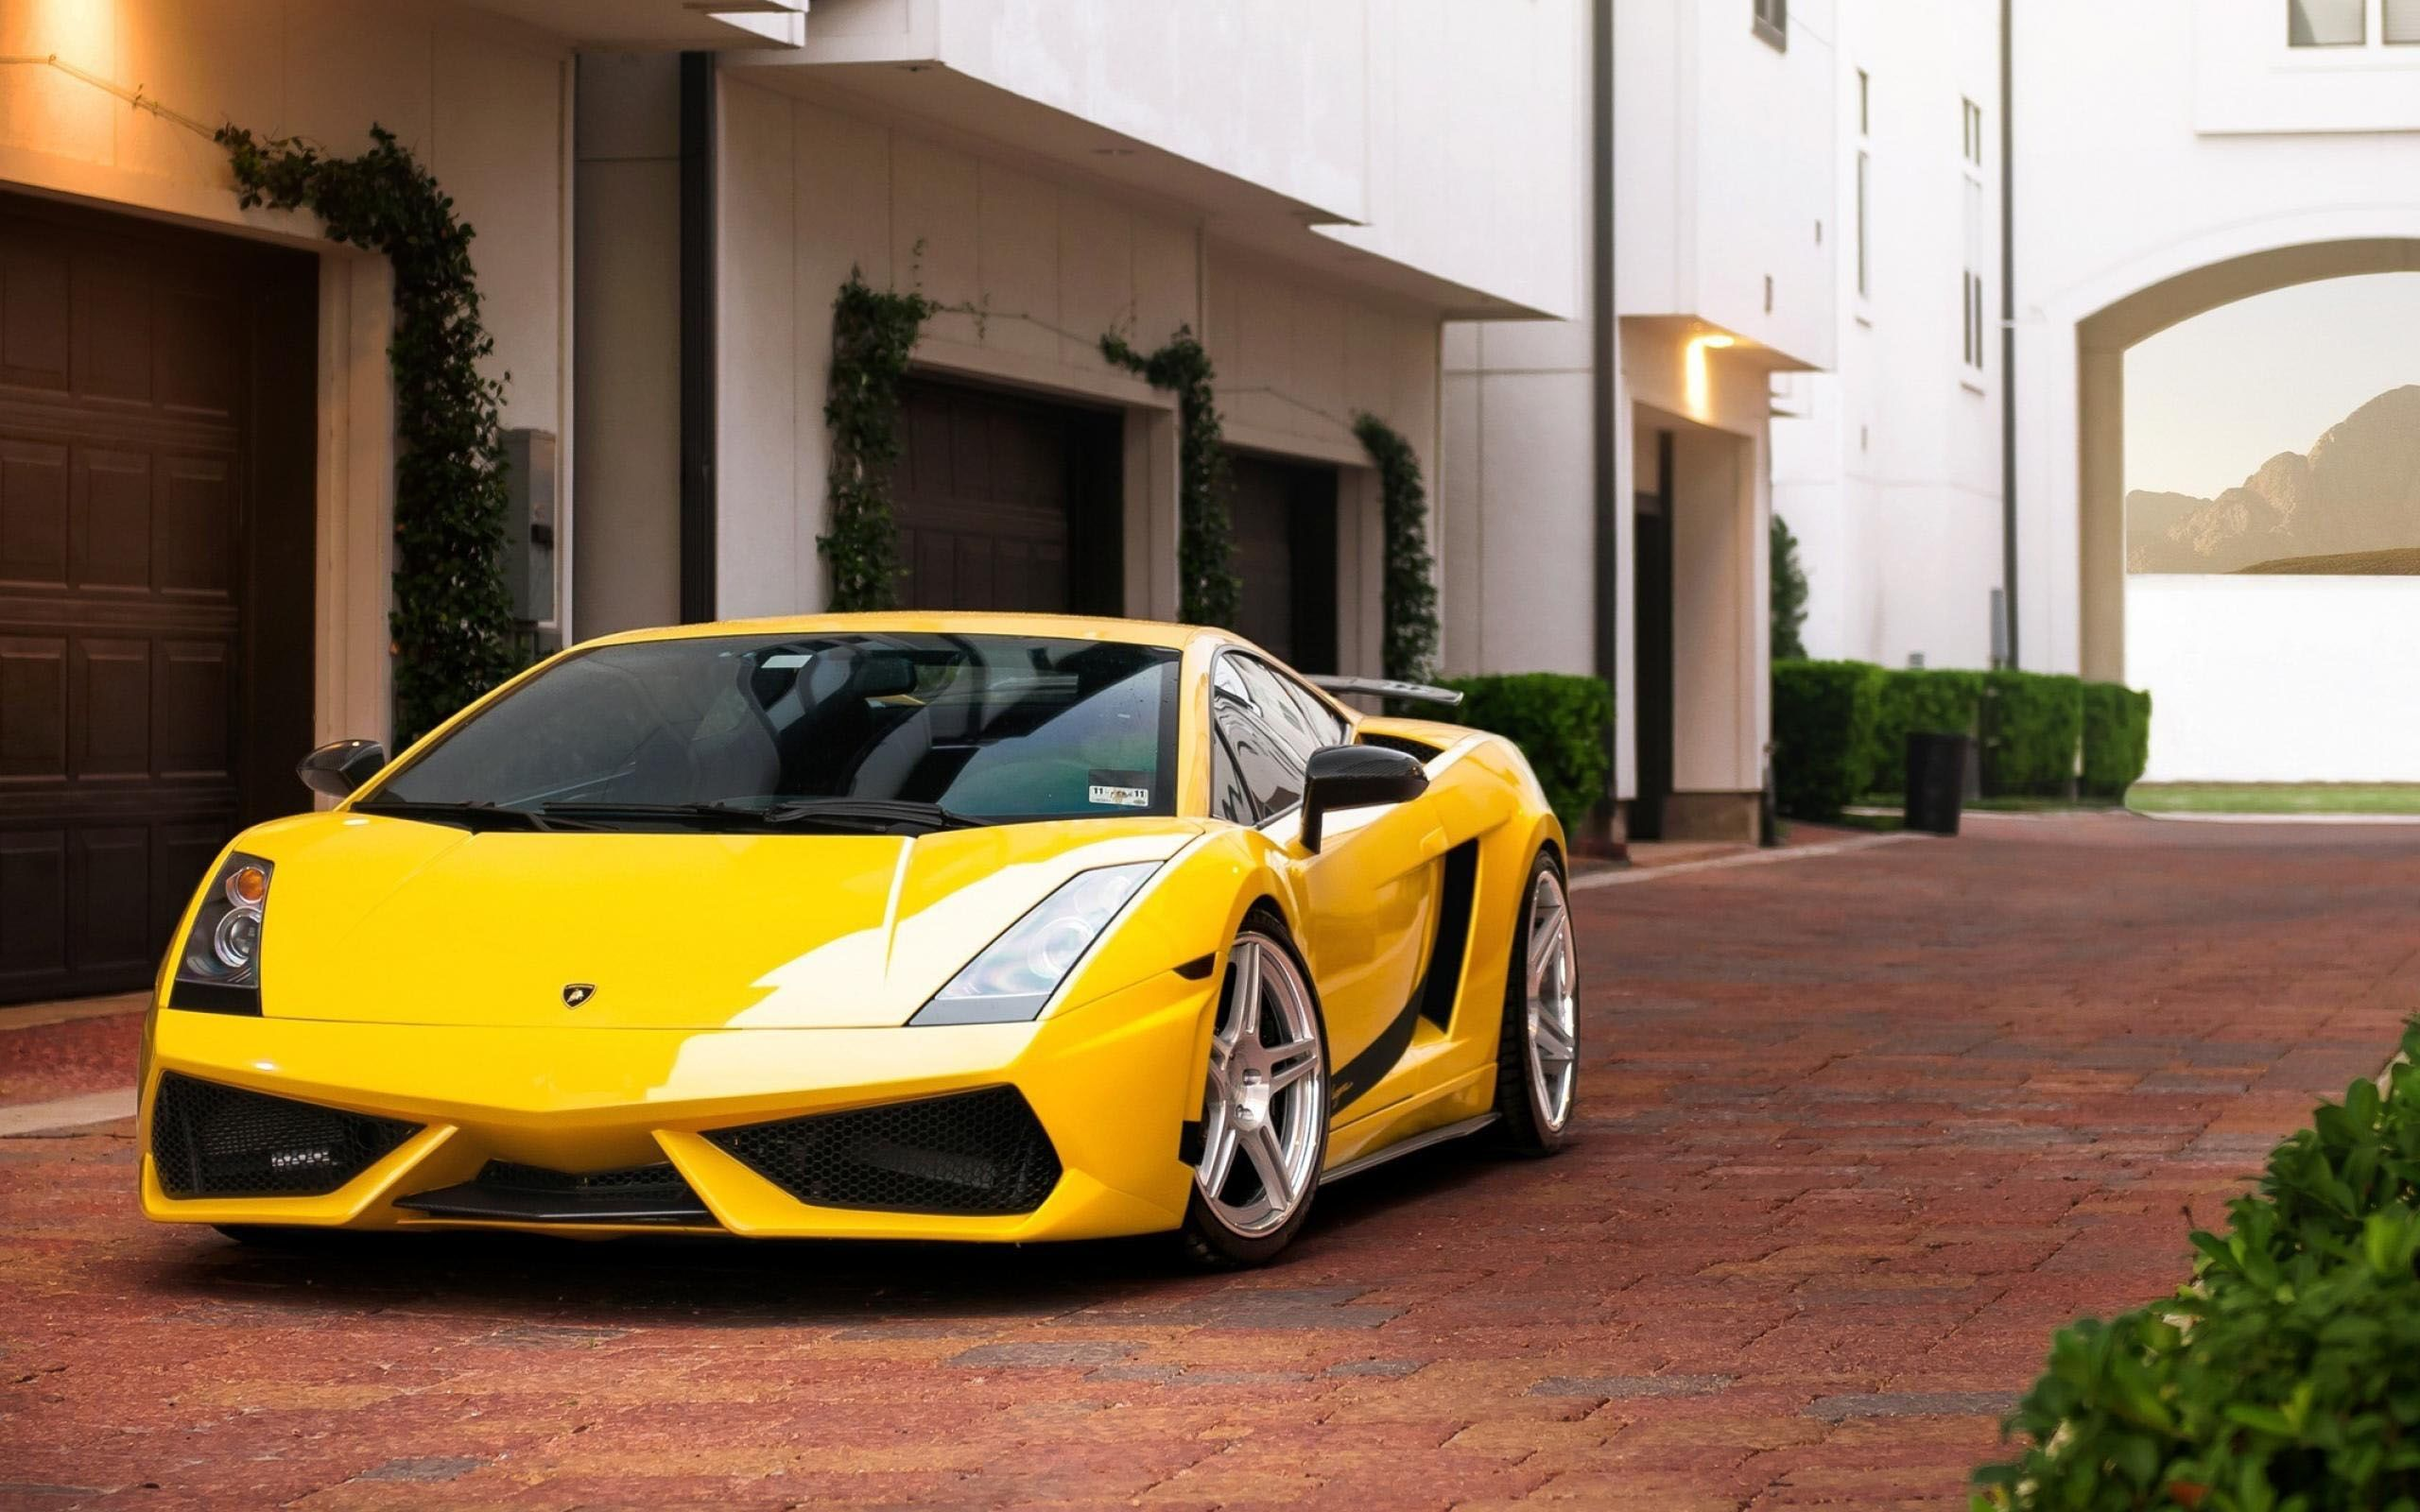 lamborghini you can download lamborghini gallardo yellow hd wallpapers - Yellow Lamborghini Gallardo Spyder Wallpaper